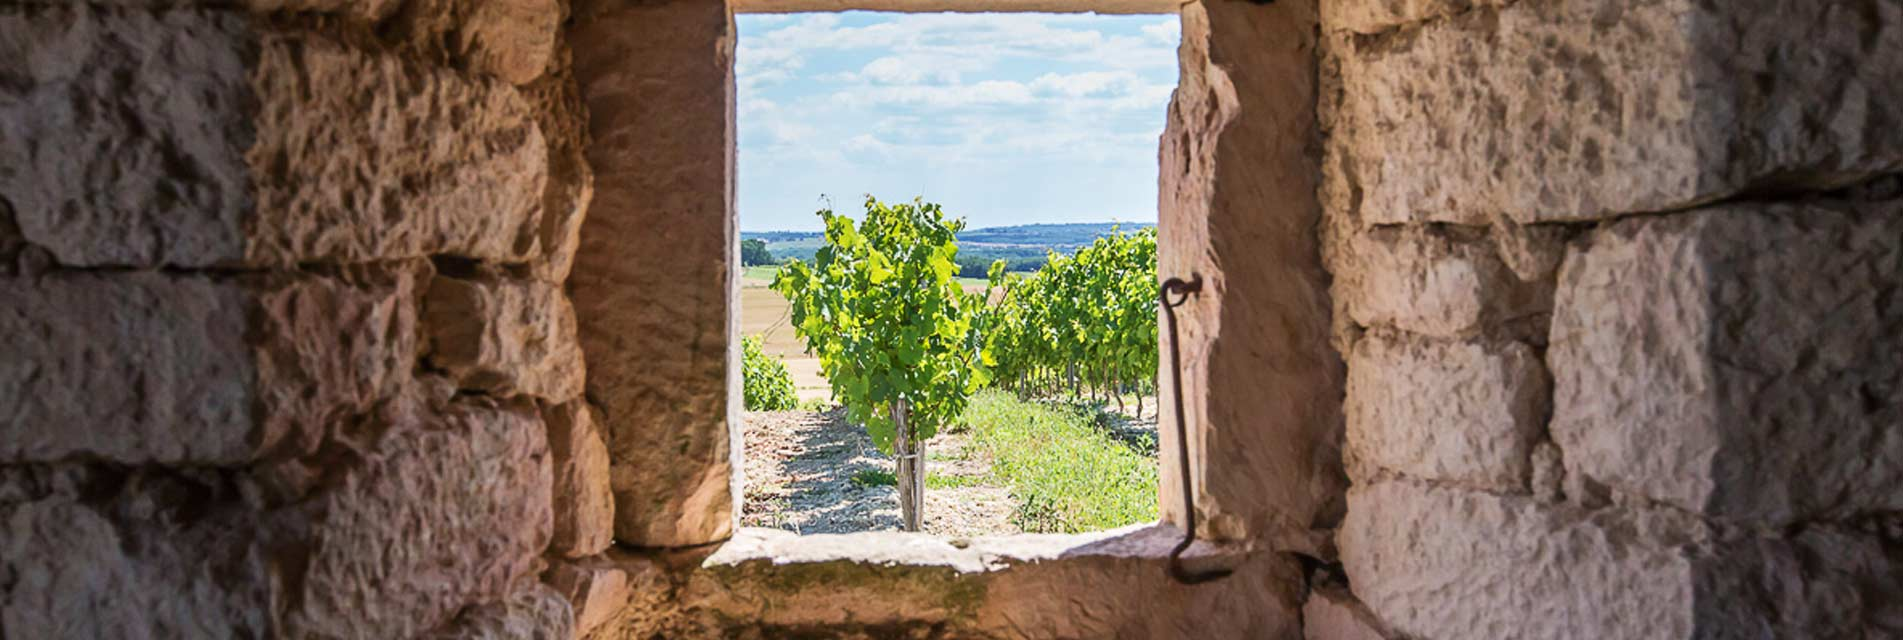 Nos Locations de vacances à petits prix dans le Tarn en Occitanie